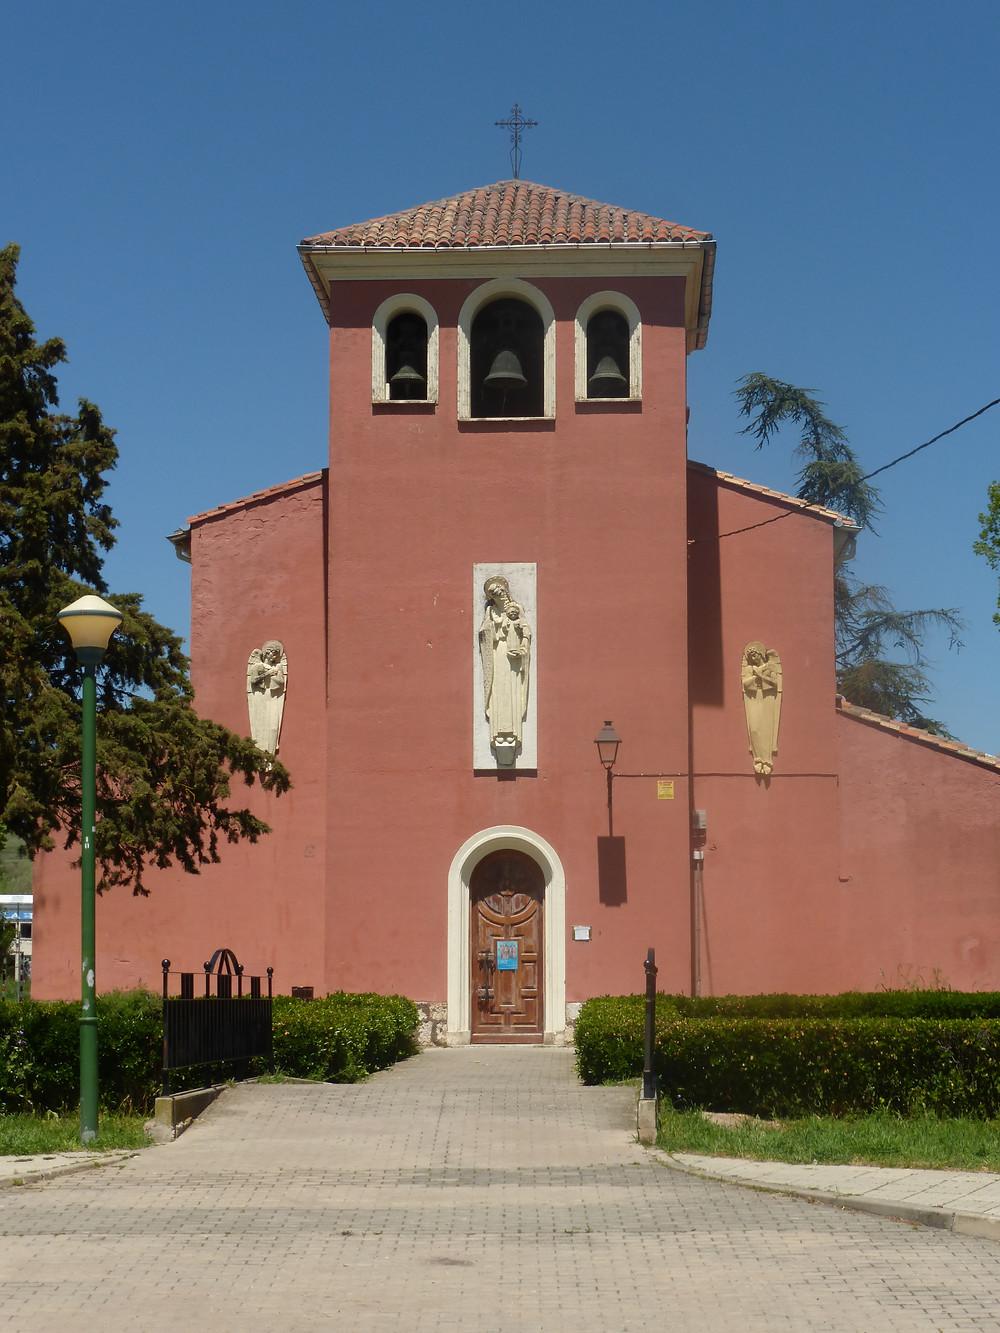 Camino Church Front outside Burgos, Spain